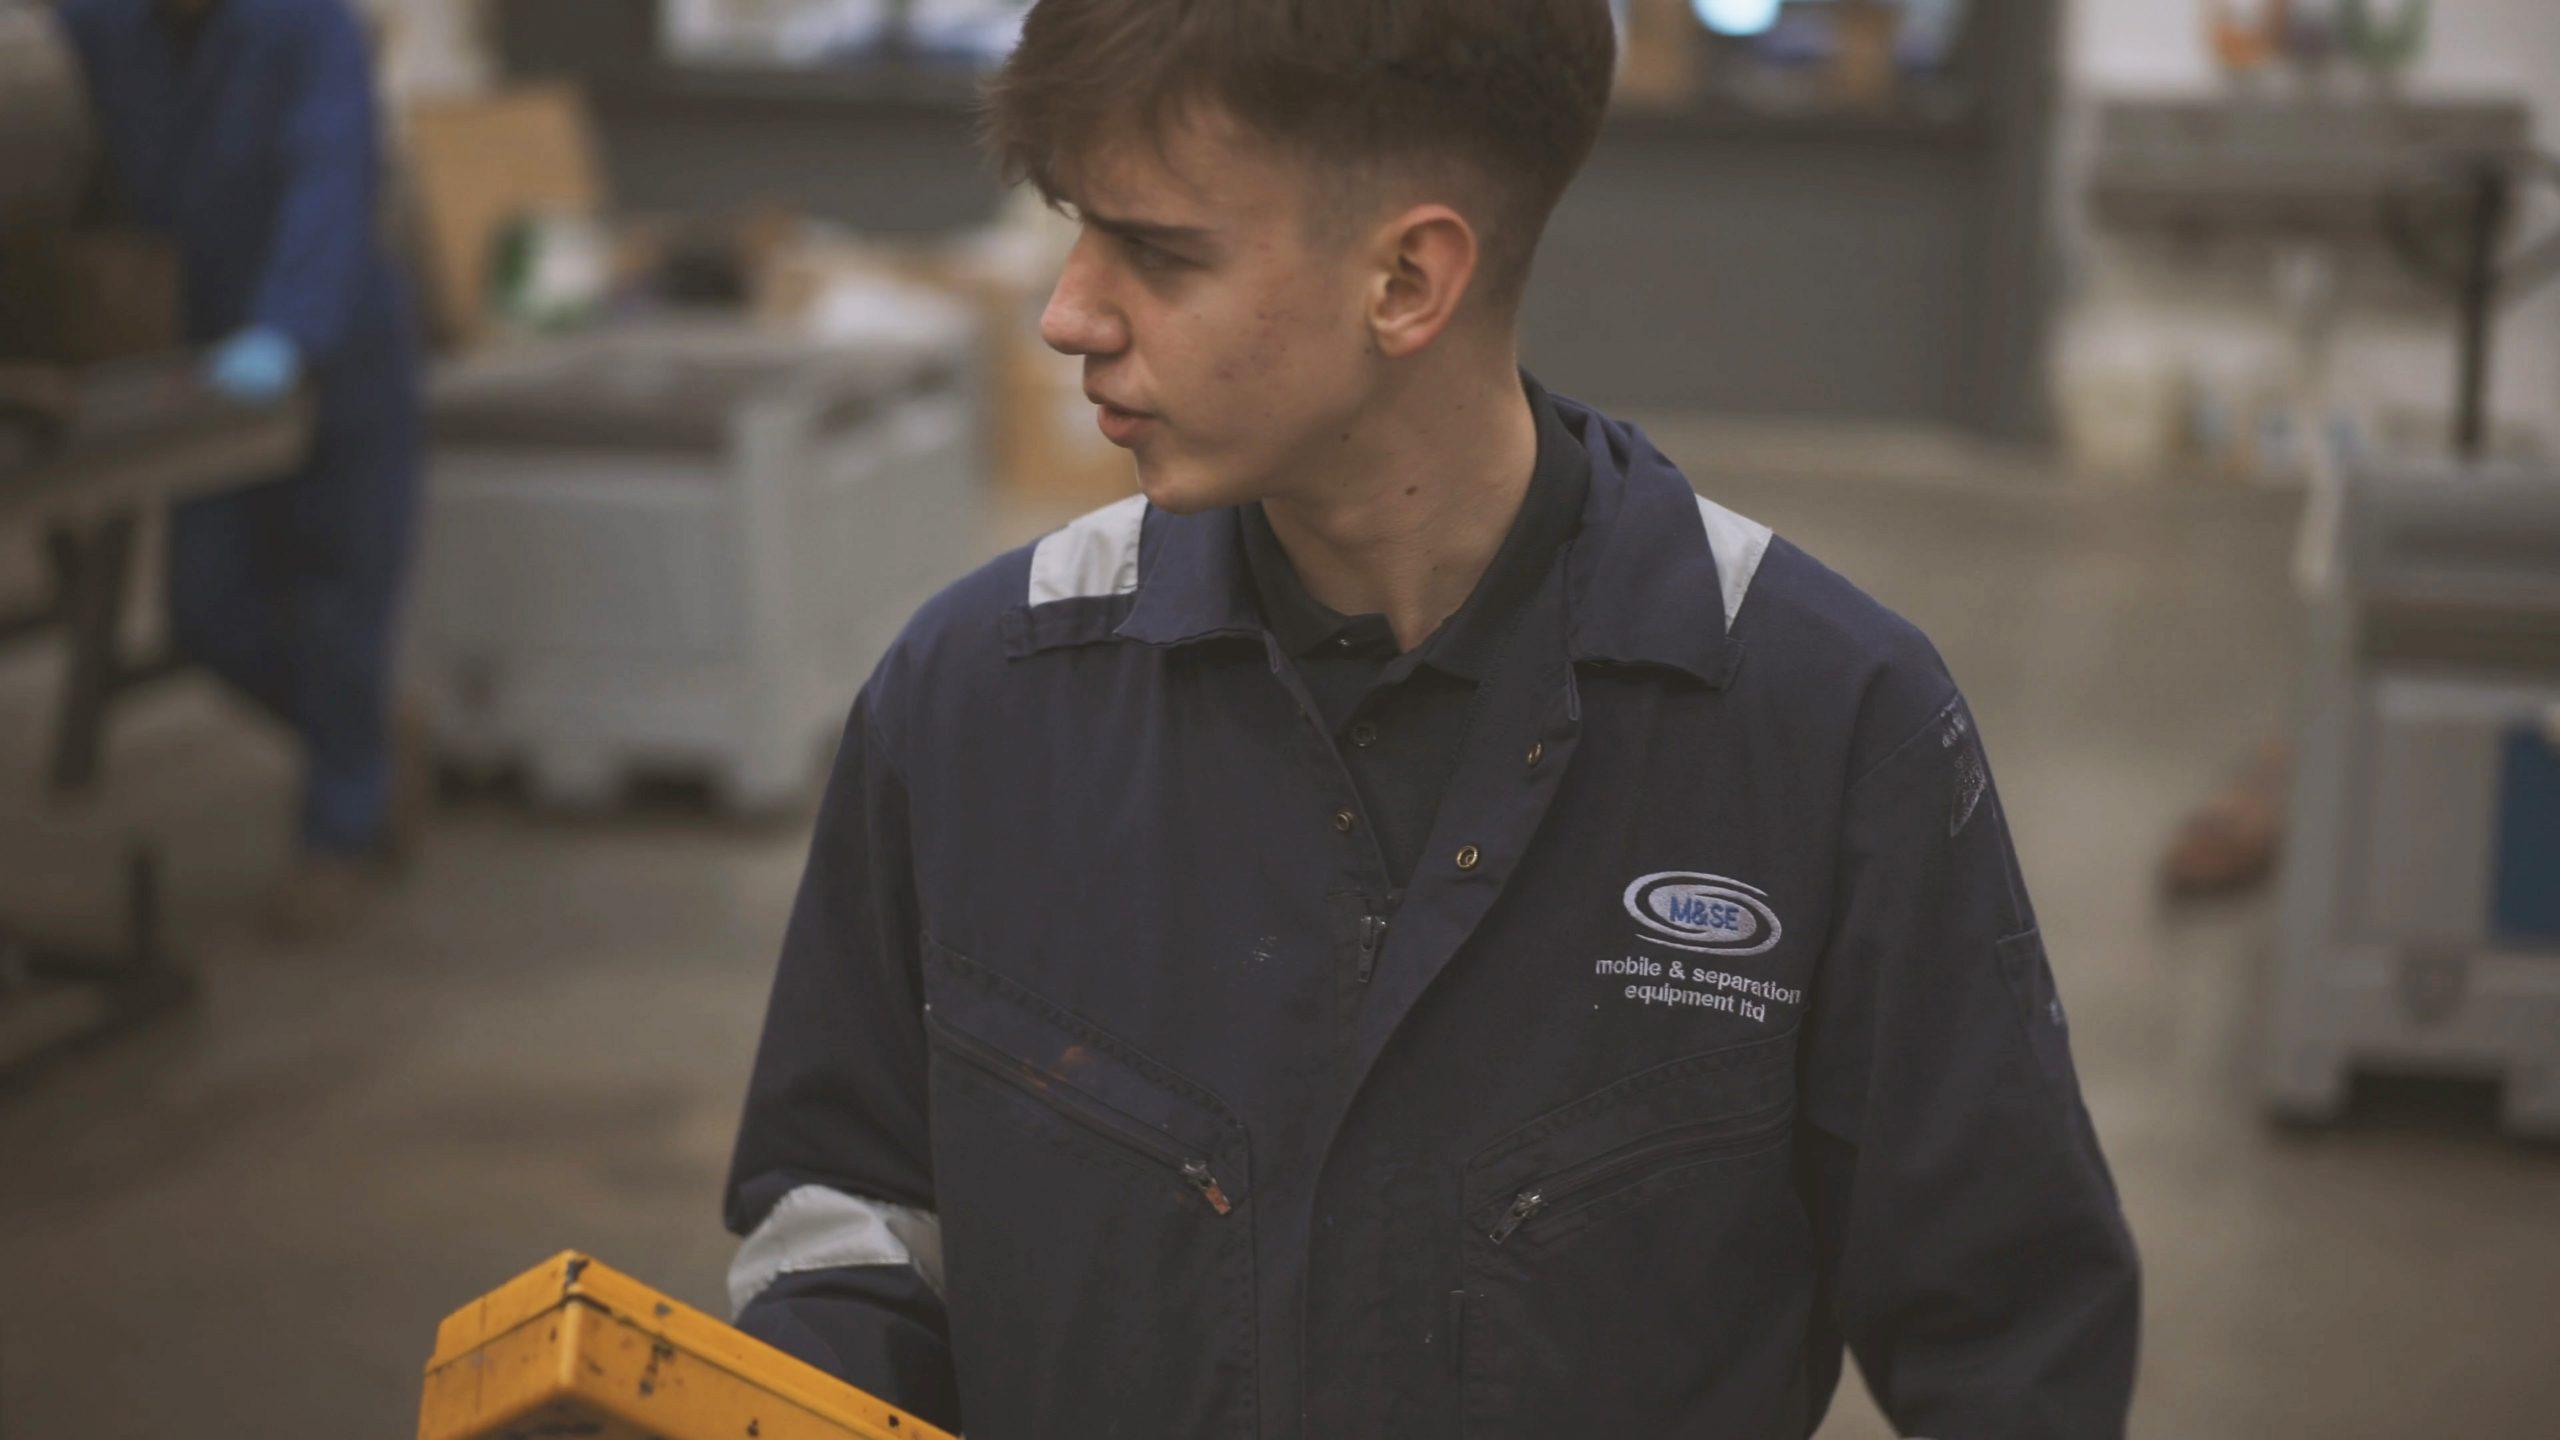 Apprentice Town Video Production